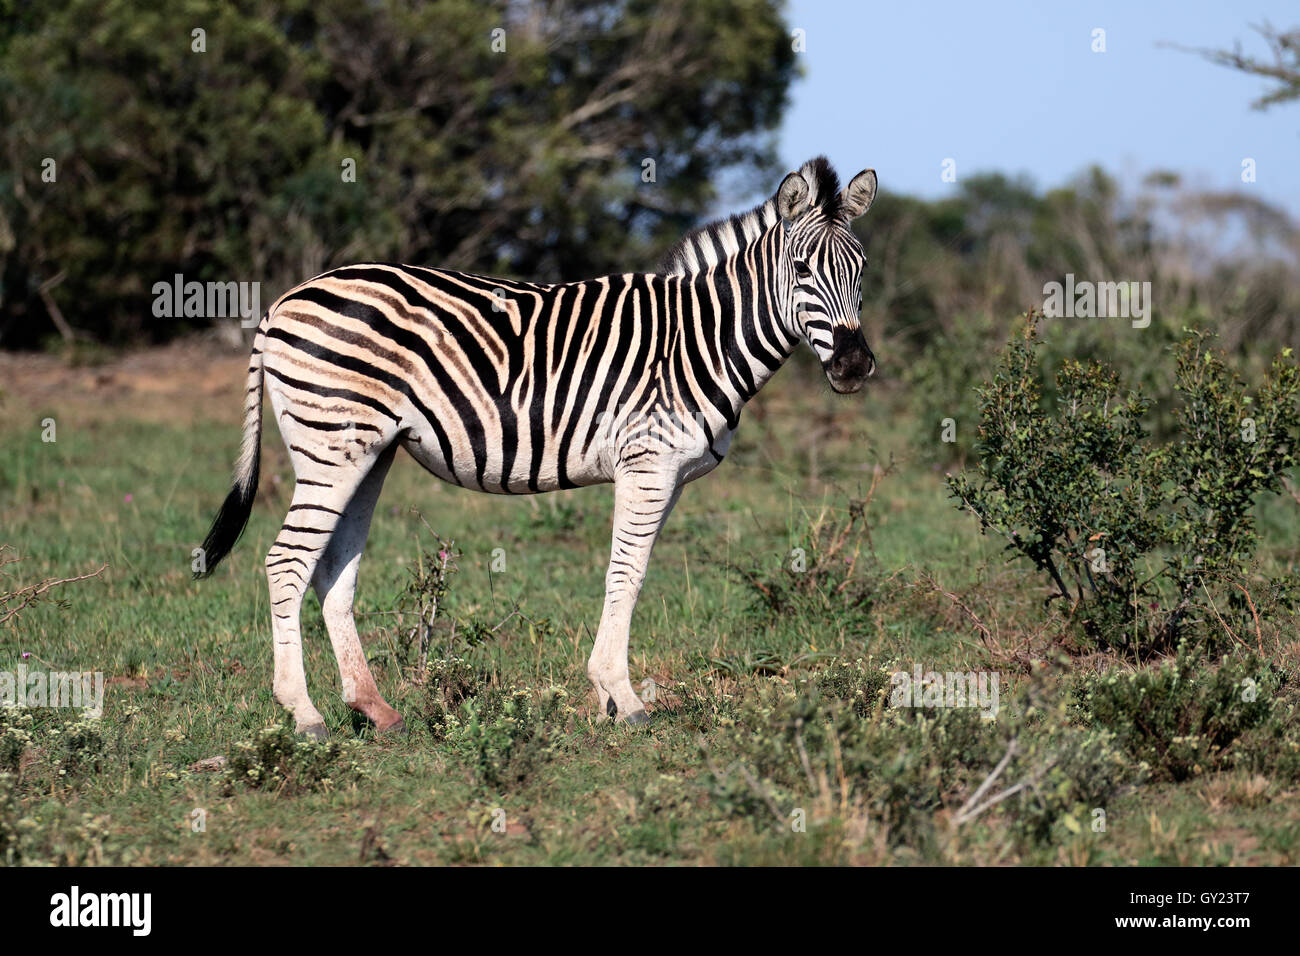 Zèbre des plaines ou zèbre commun, Burchell, Equus quagga zebra, seul mammifère, Namibie, août Photo Stock